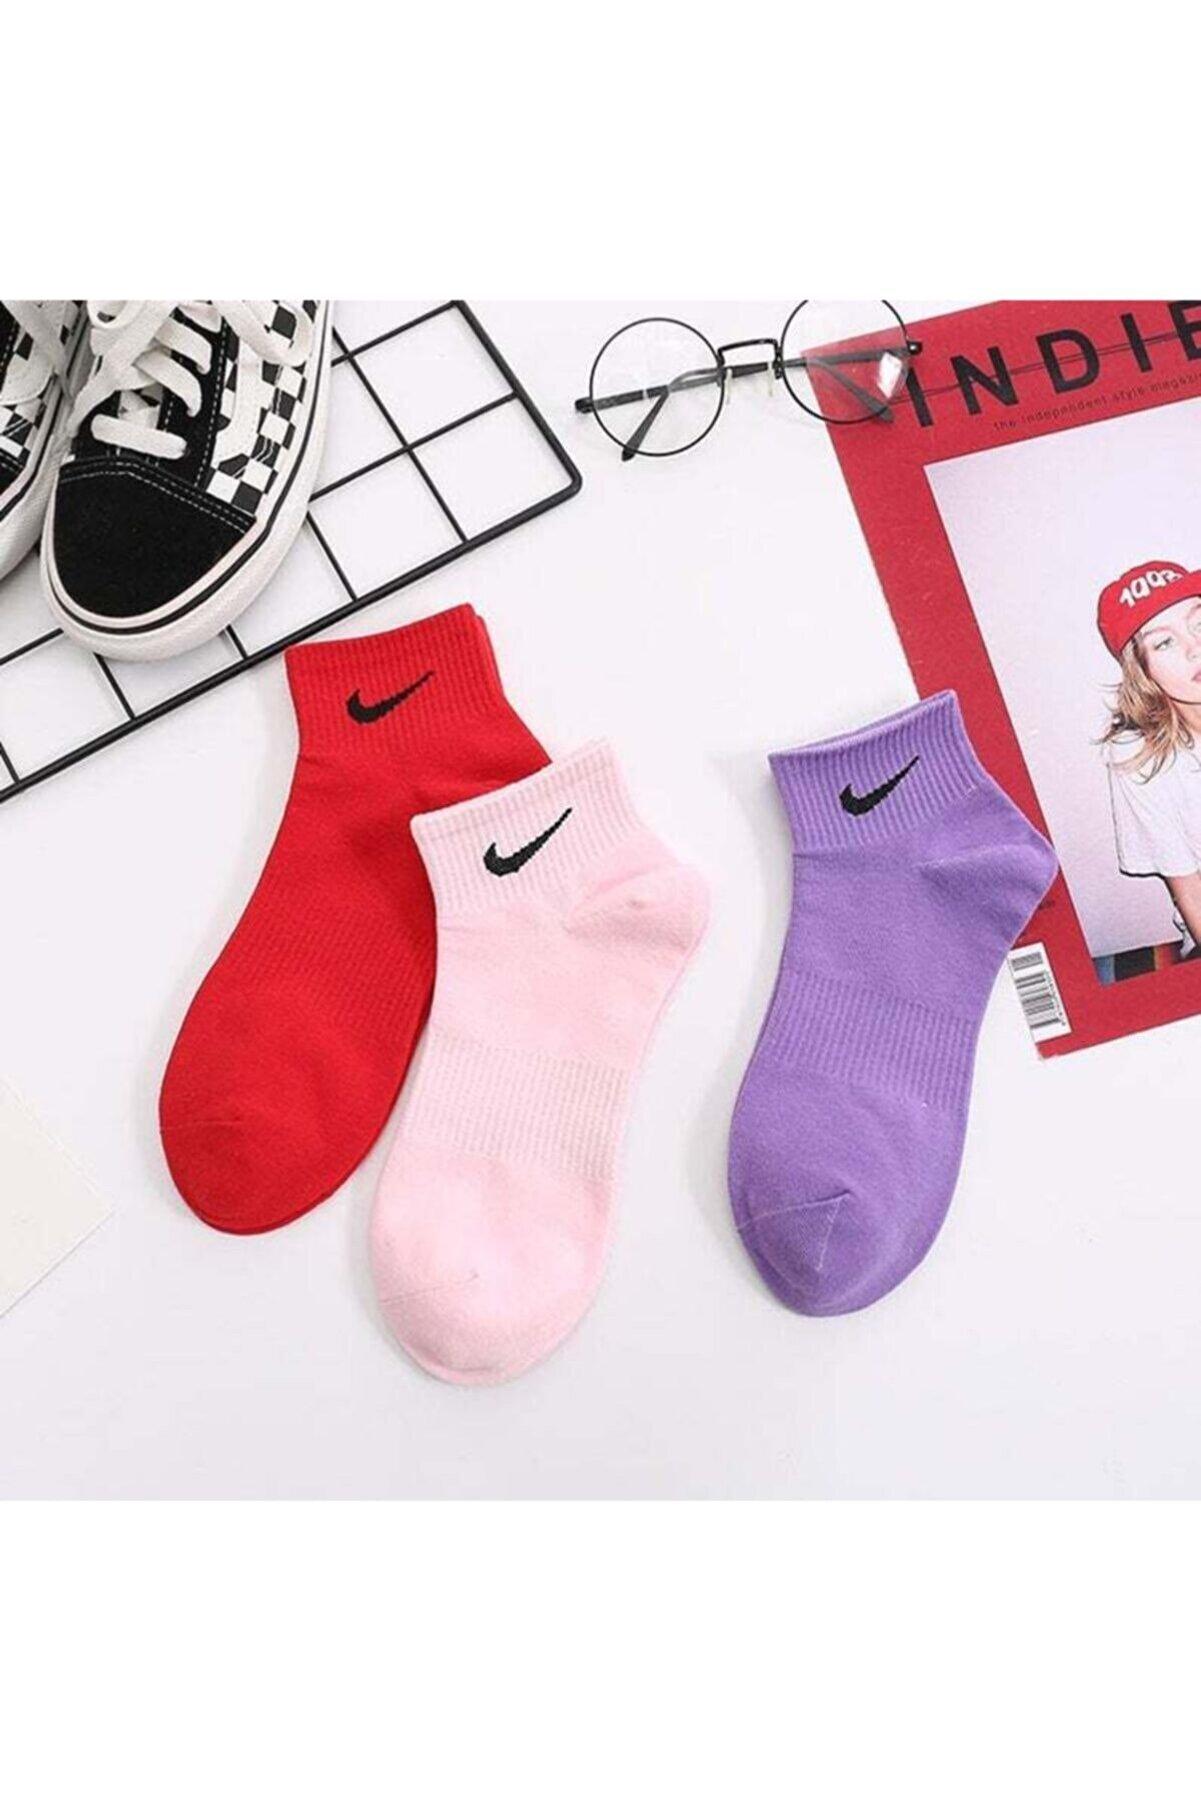 SOCKS-SHOW Renkli Çorap Seti Tik İşaretli 3'lü